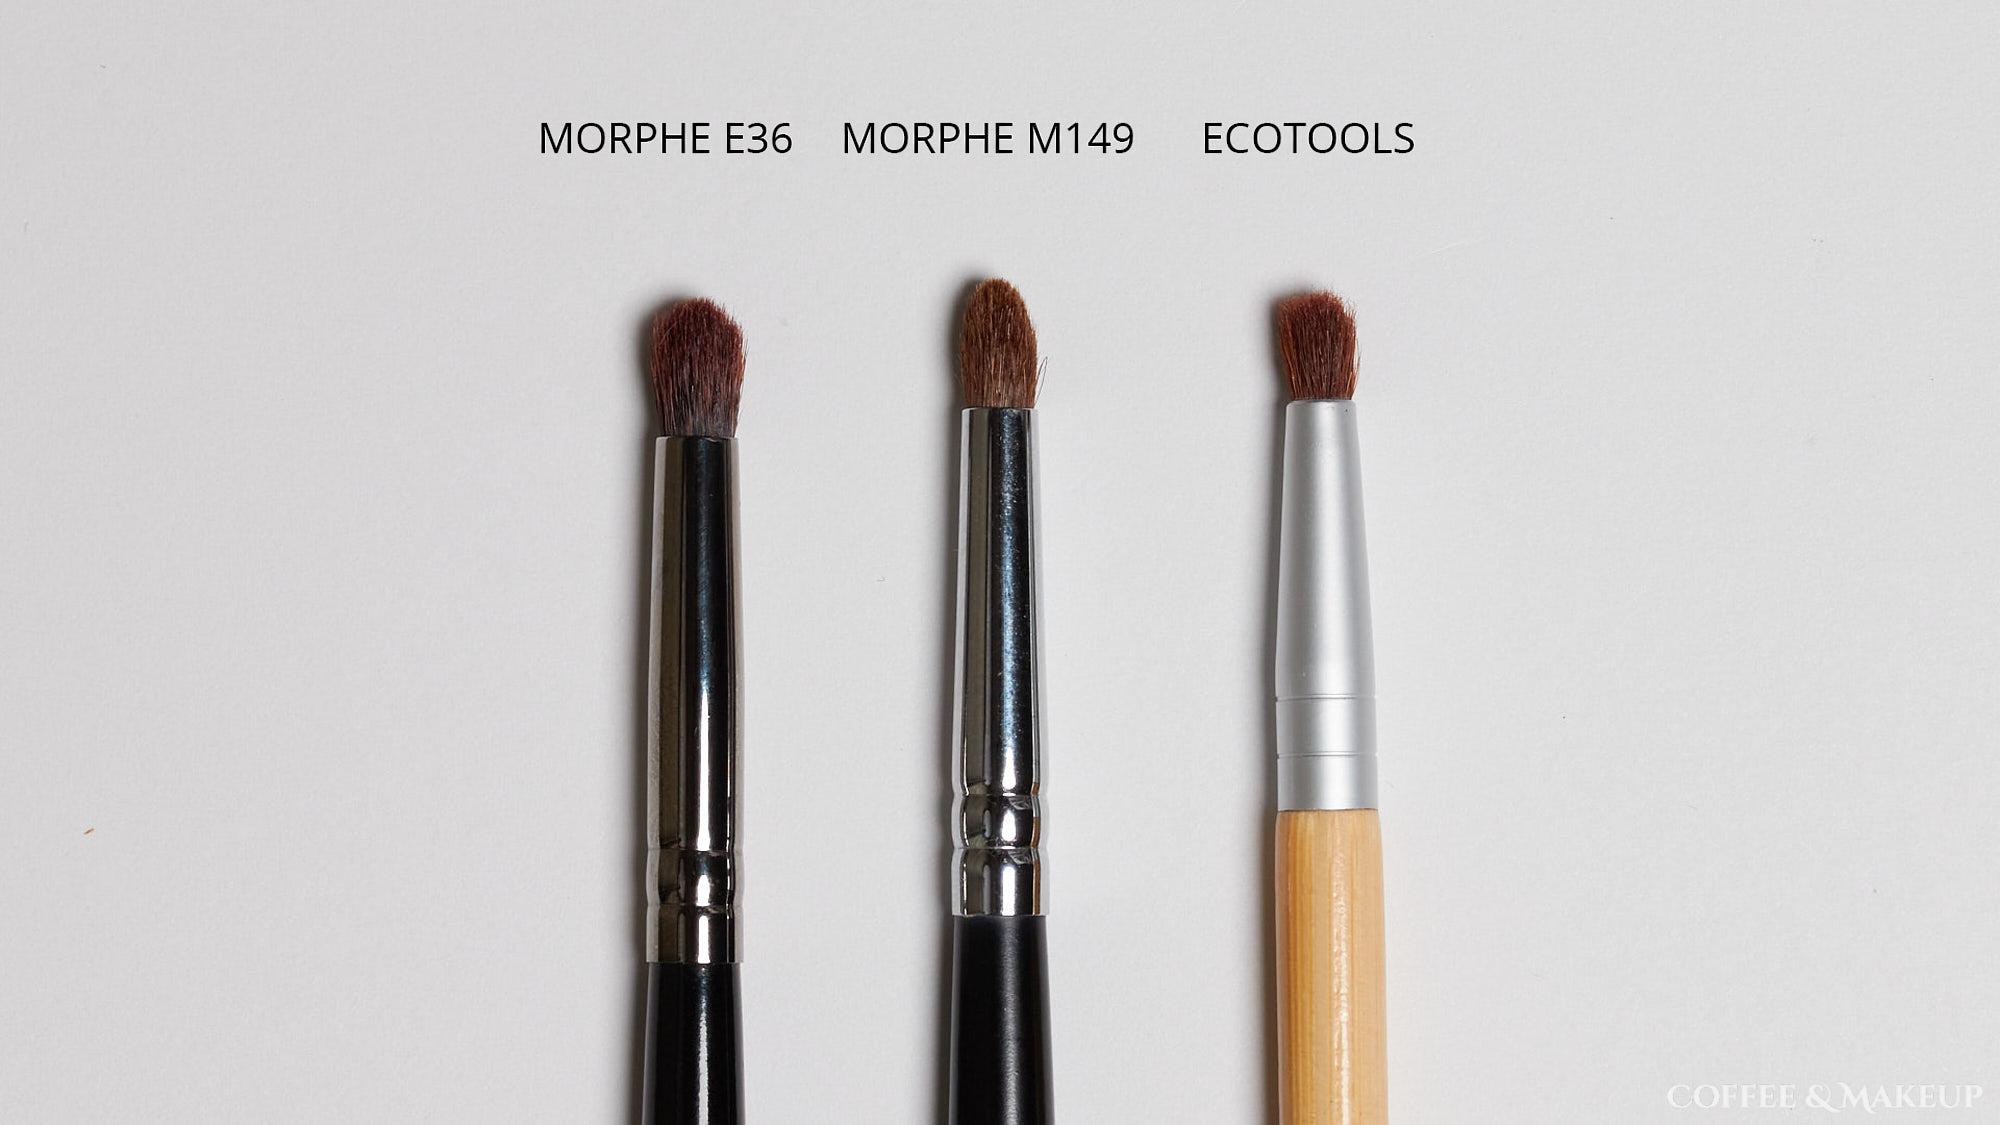 Morphe E36 Comparisons